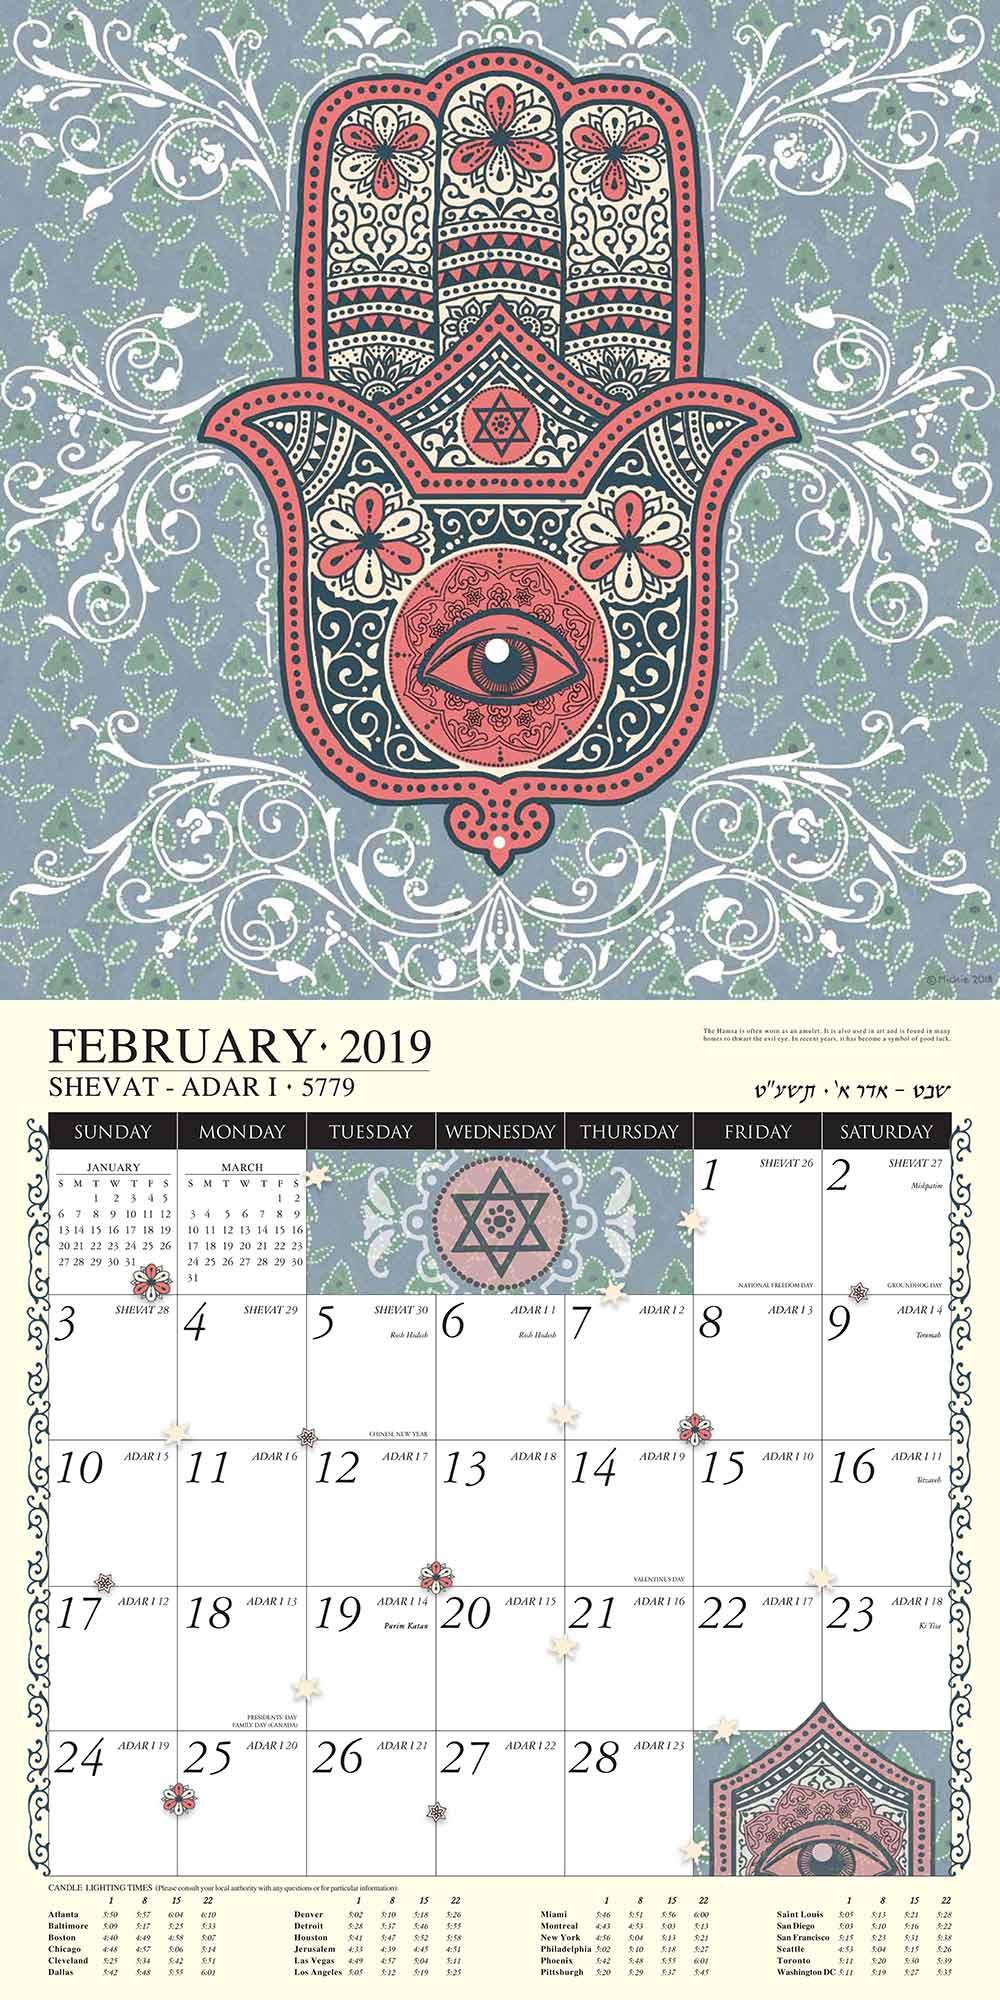 Jewish Art Calendar 2019 by Mickie Caspi February